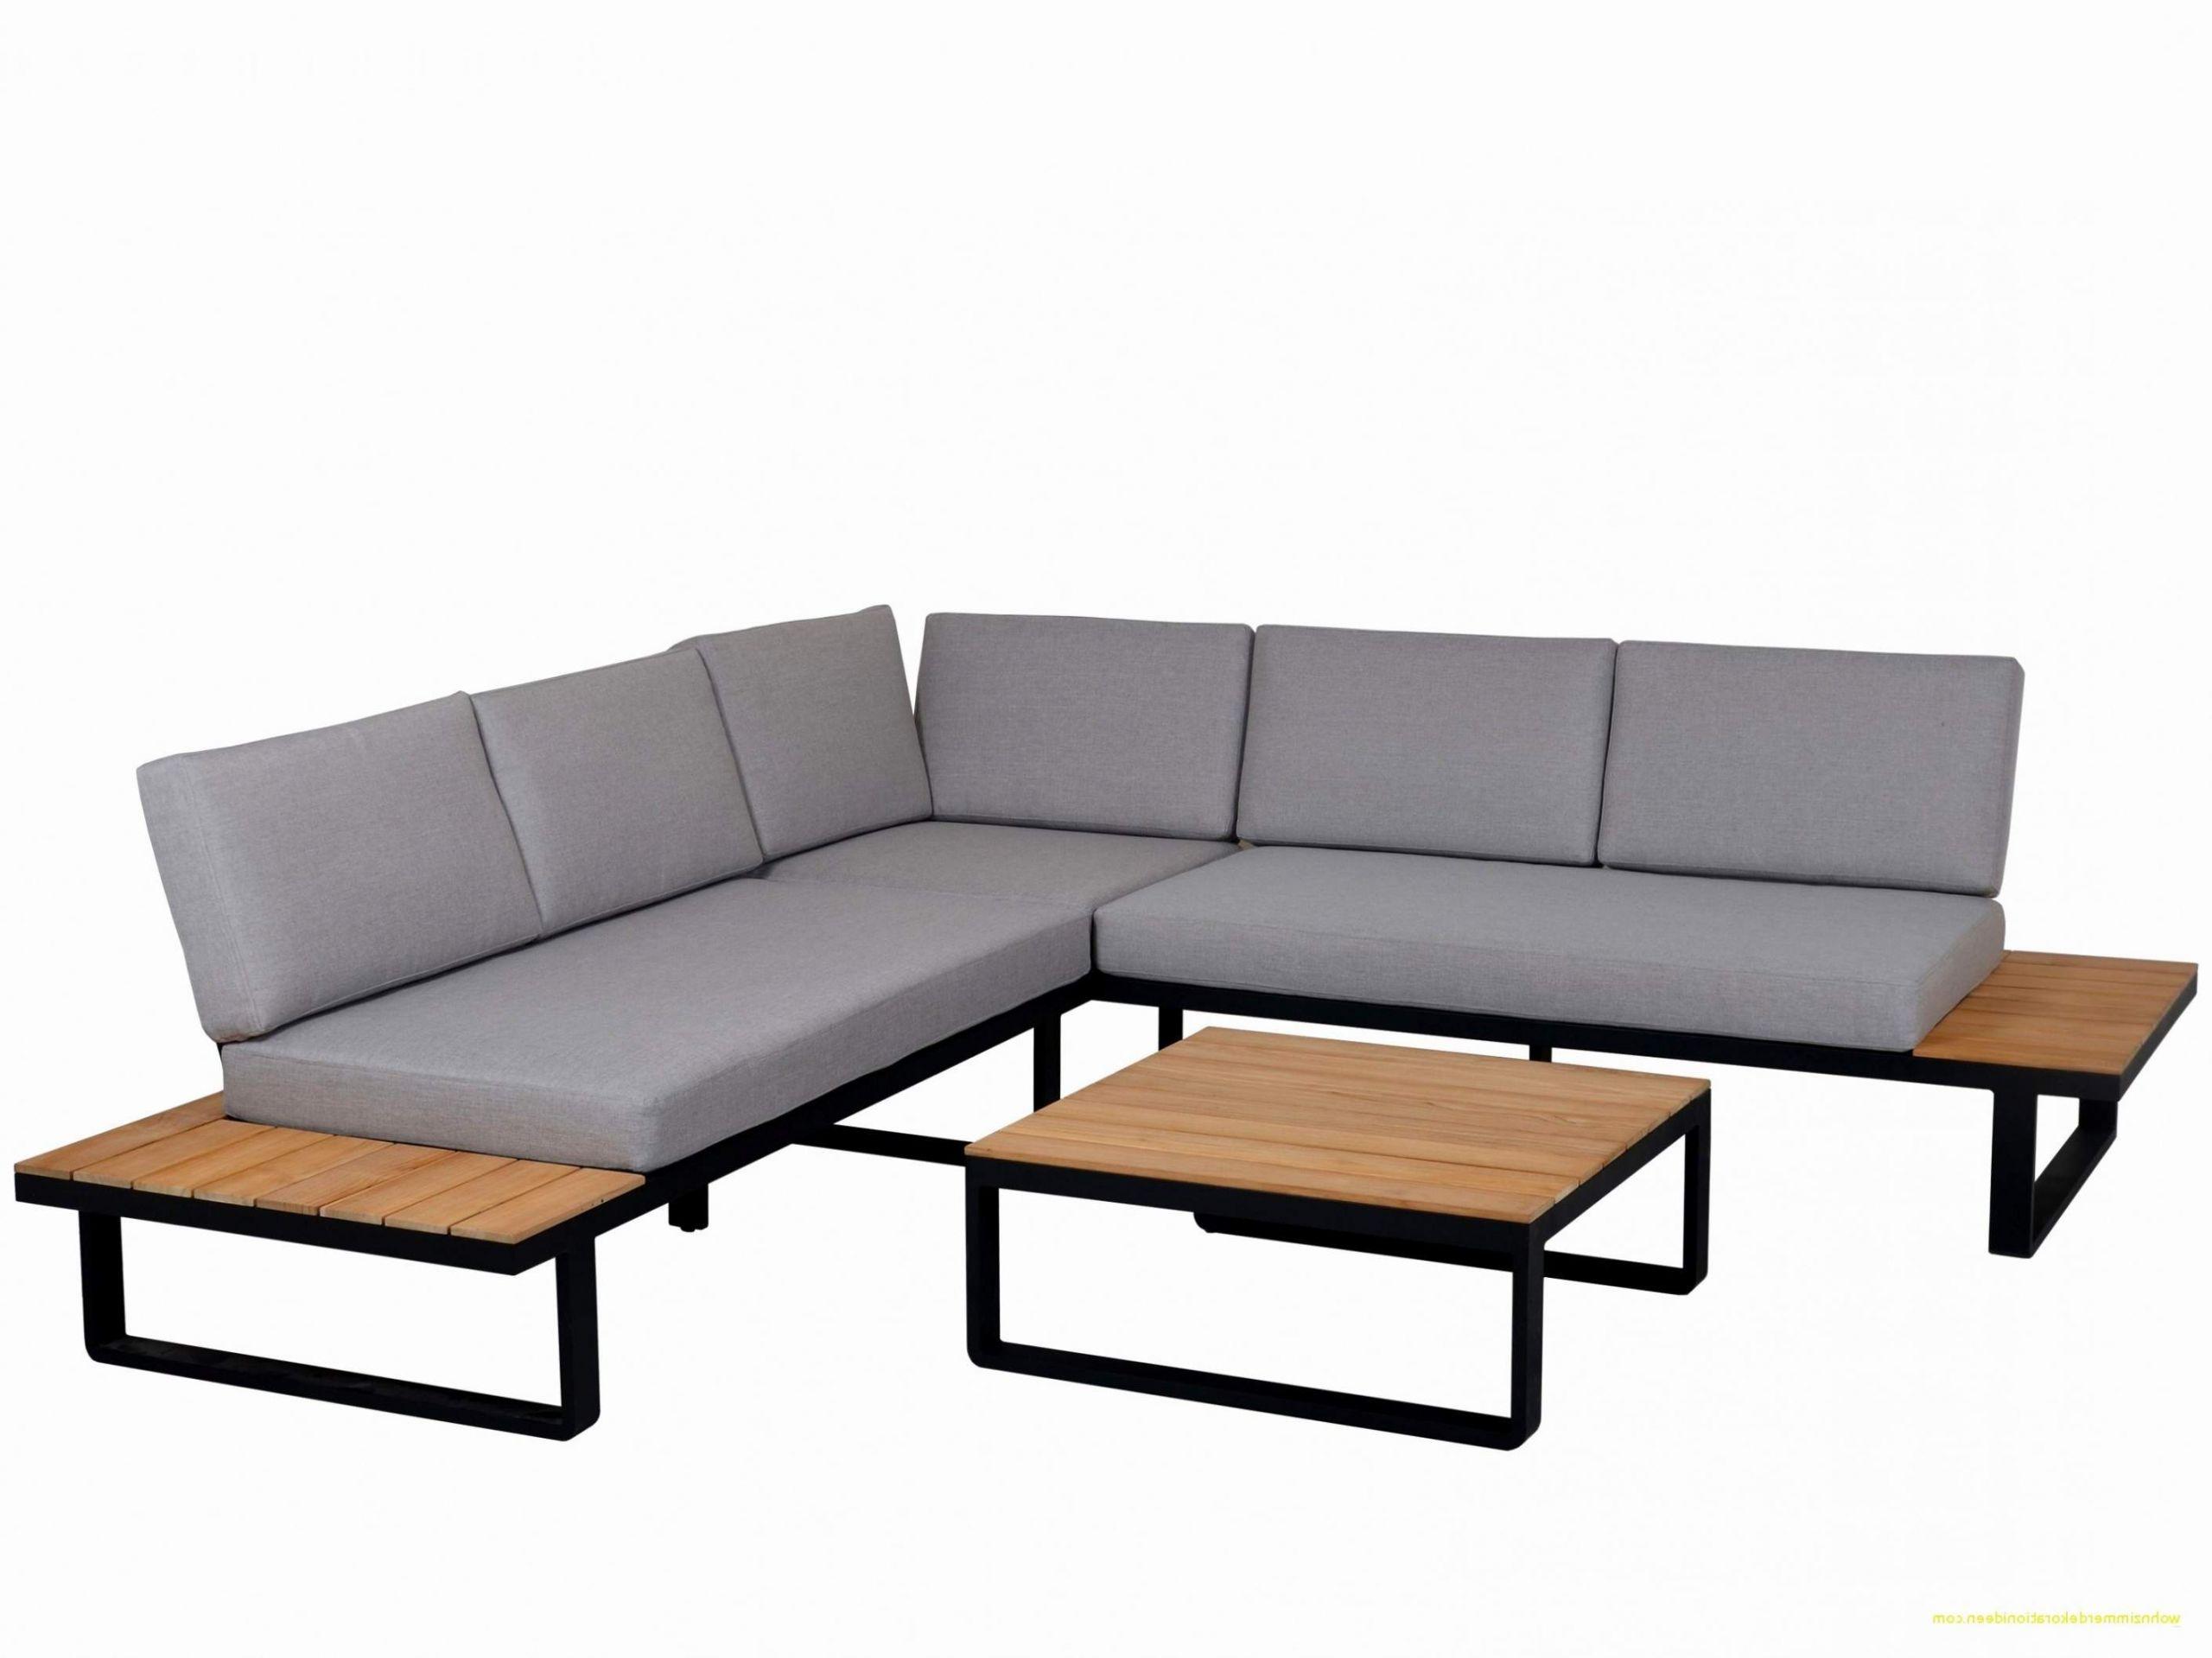 87 neu garten lounge sessel gdxt70hk of sessel und sofa